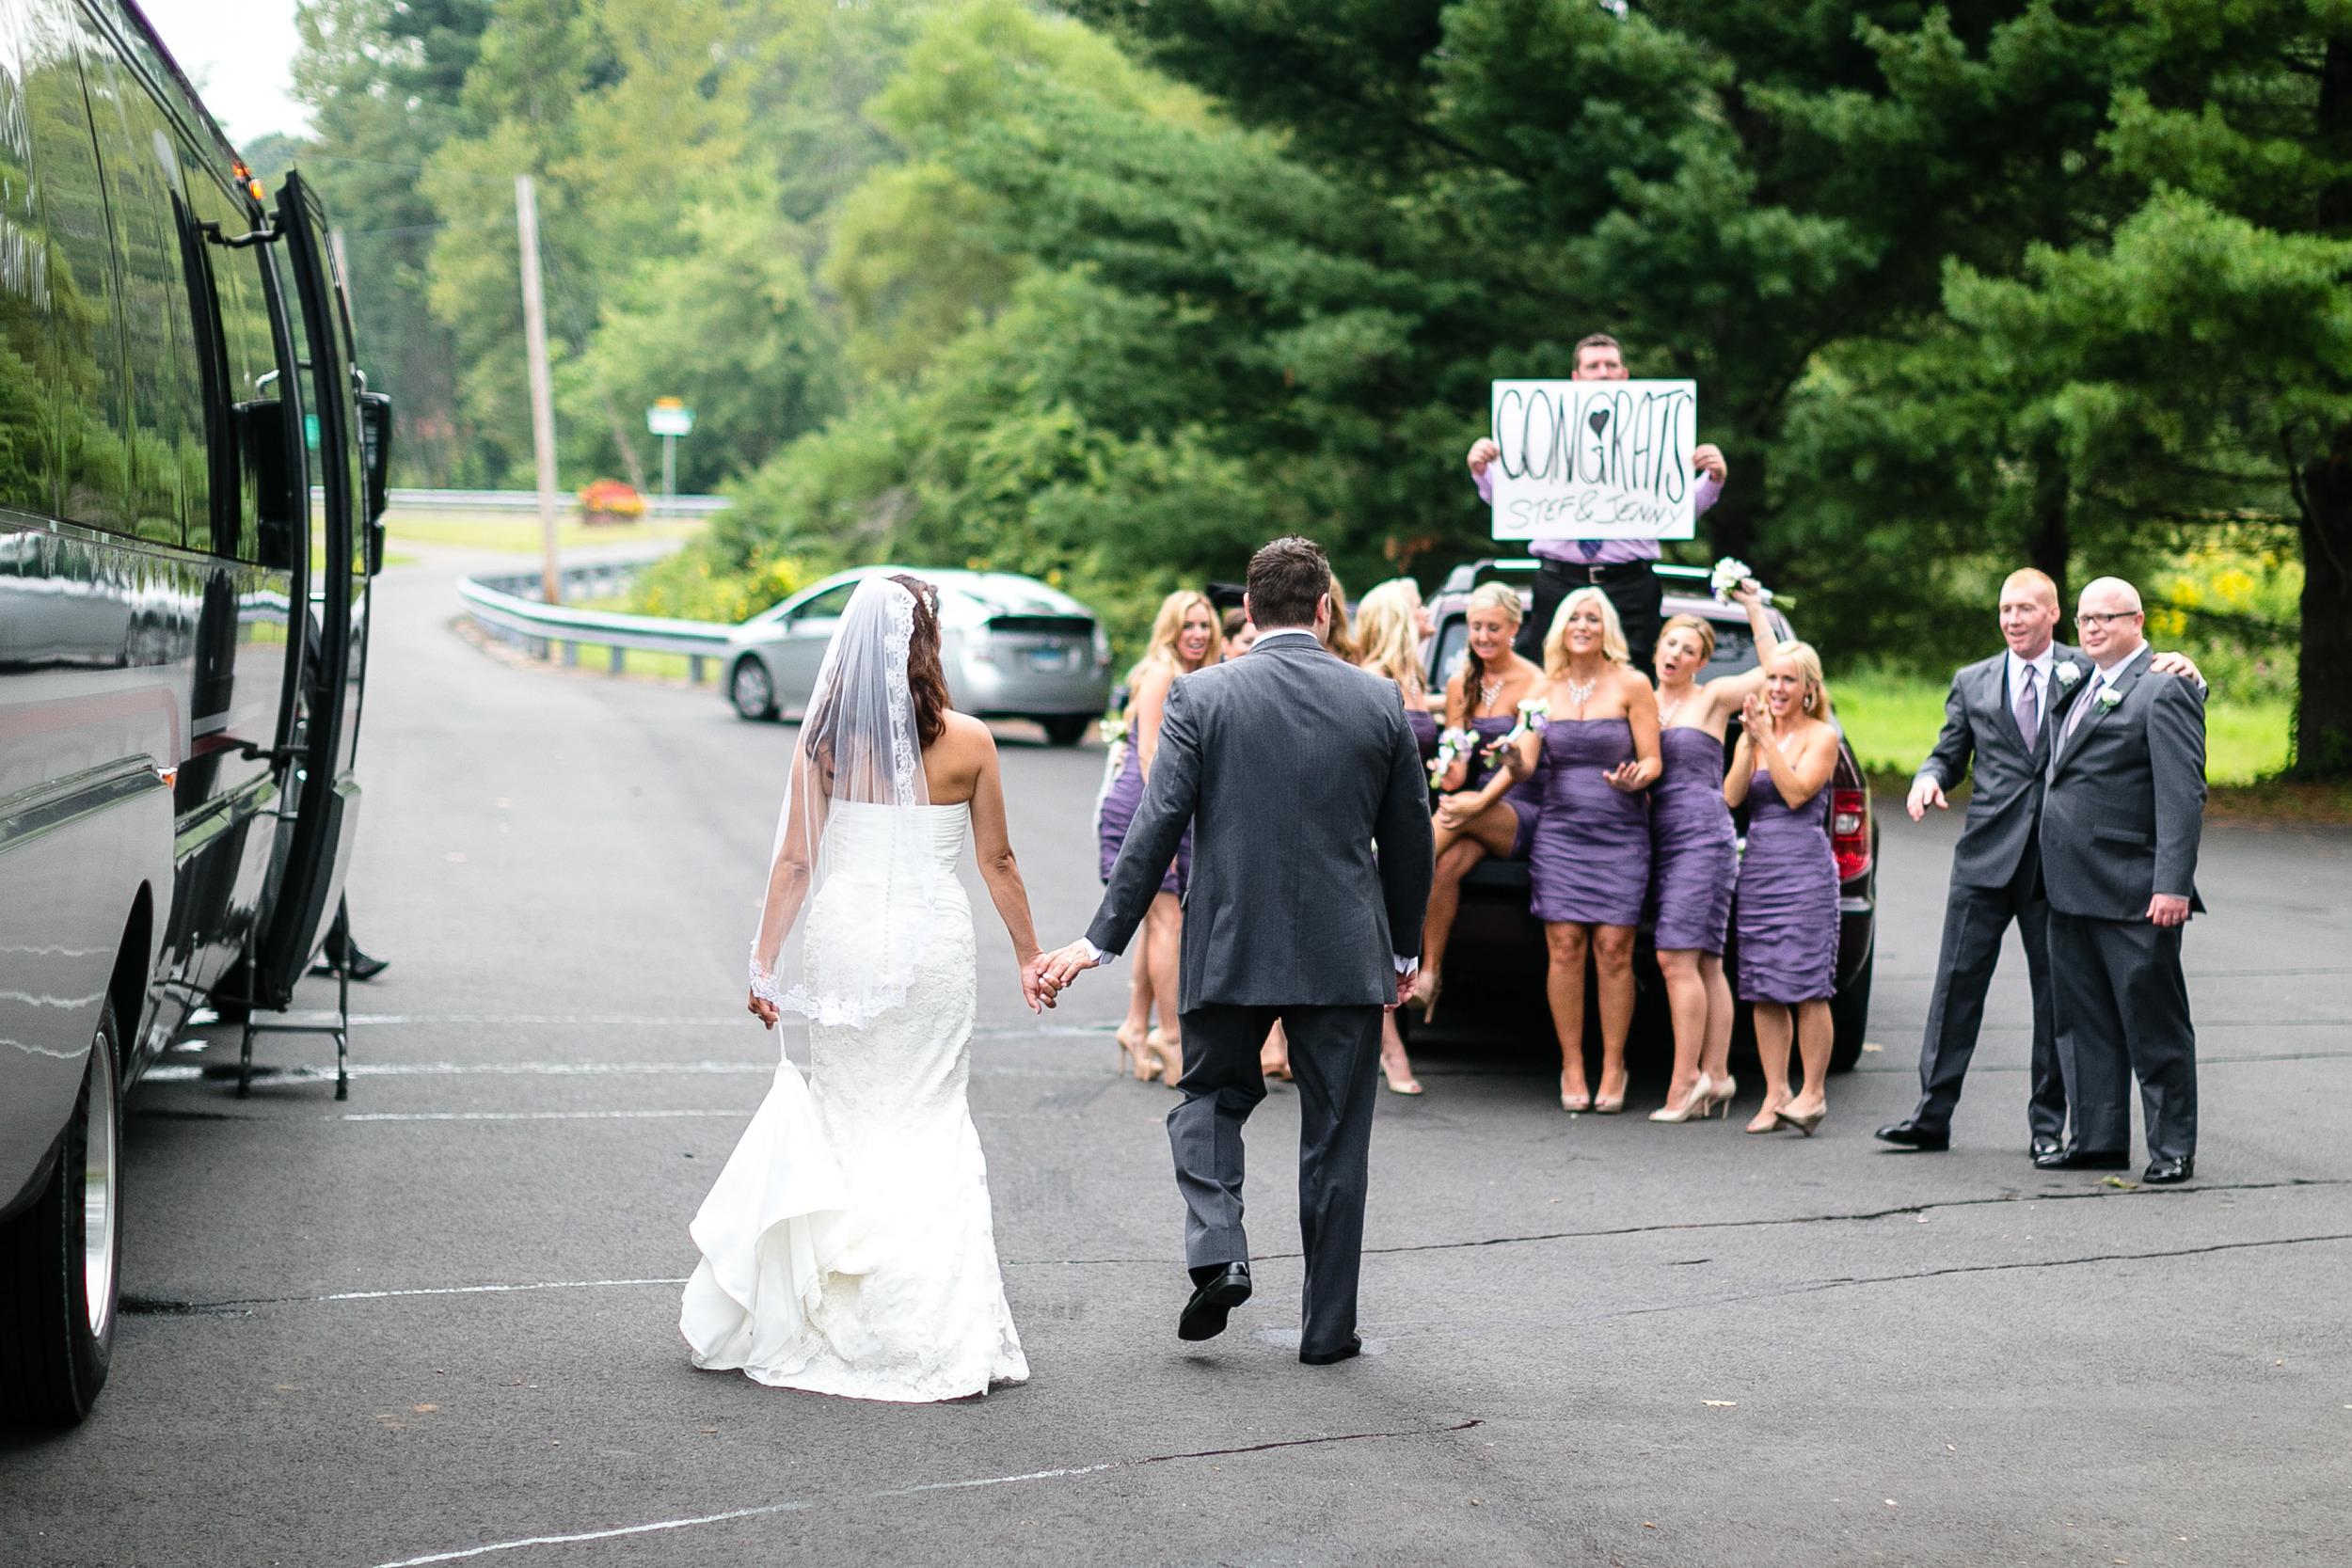 Riverview-Wedding-Simsbury-Connecticut-Documentary-Photography-by-Jacek-Dolata-4.jpg